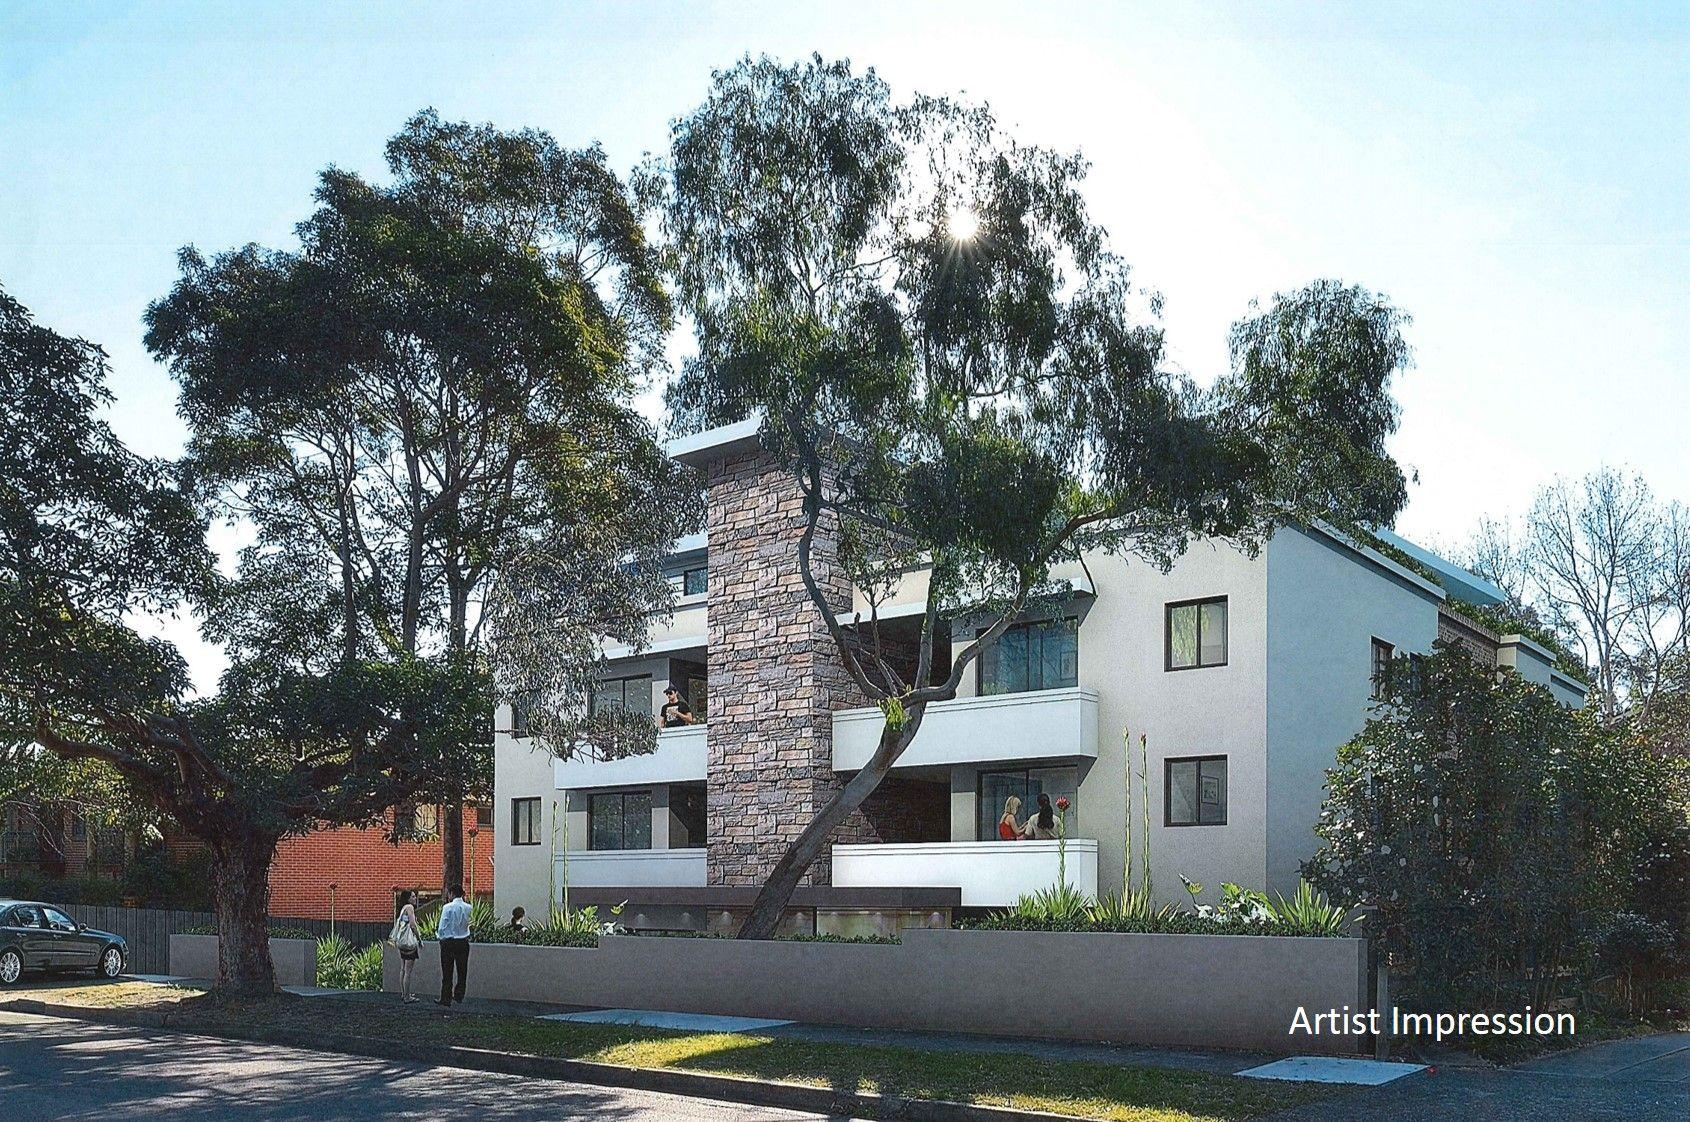 120-122 Edenholme Road, Wareemba